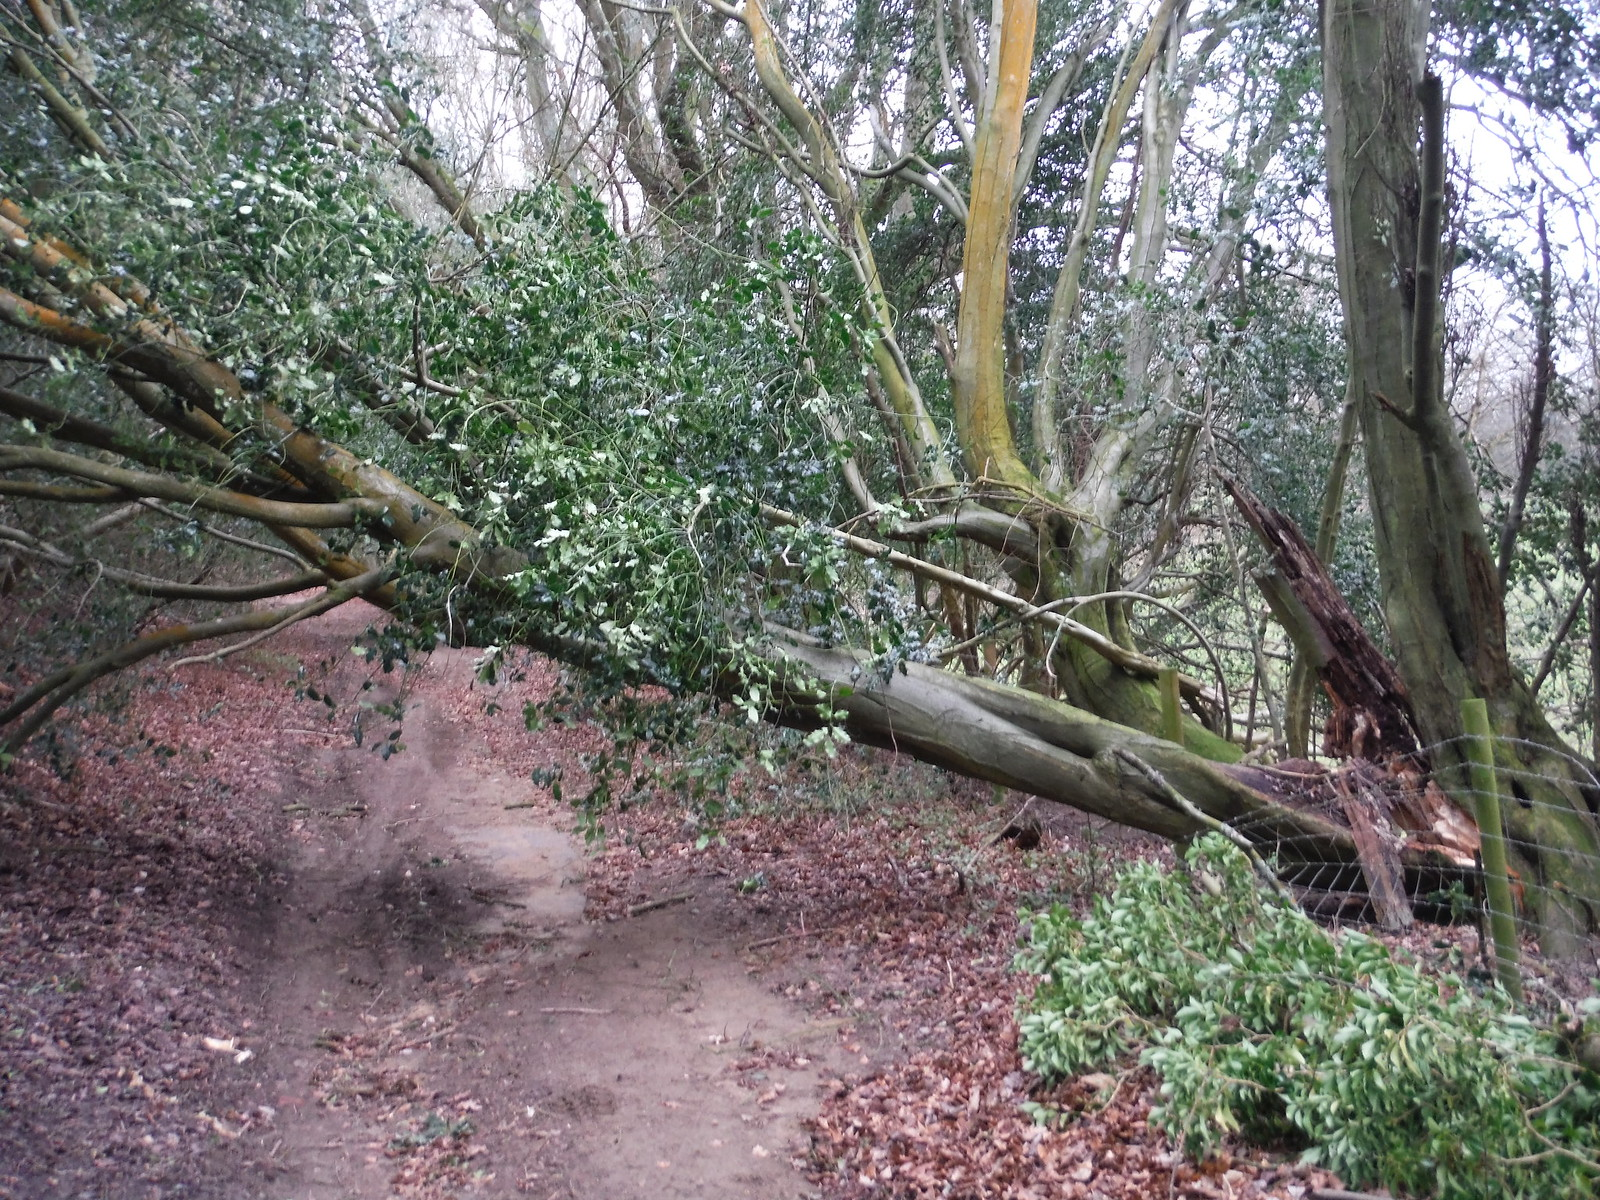 Storm 'Doris' has gone through SWC Walk 144 Haslemere to Farnham